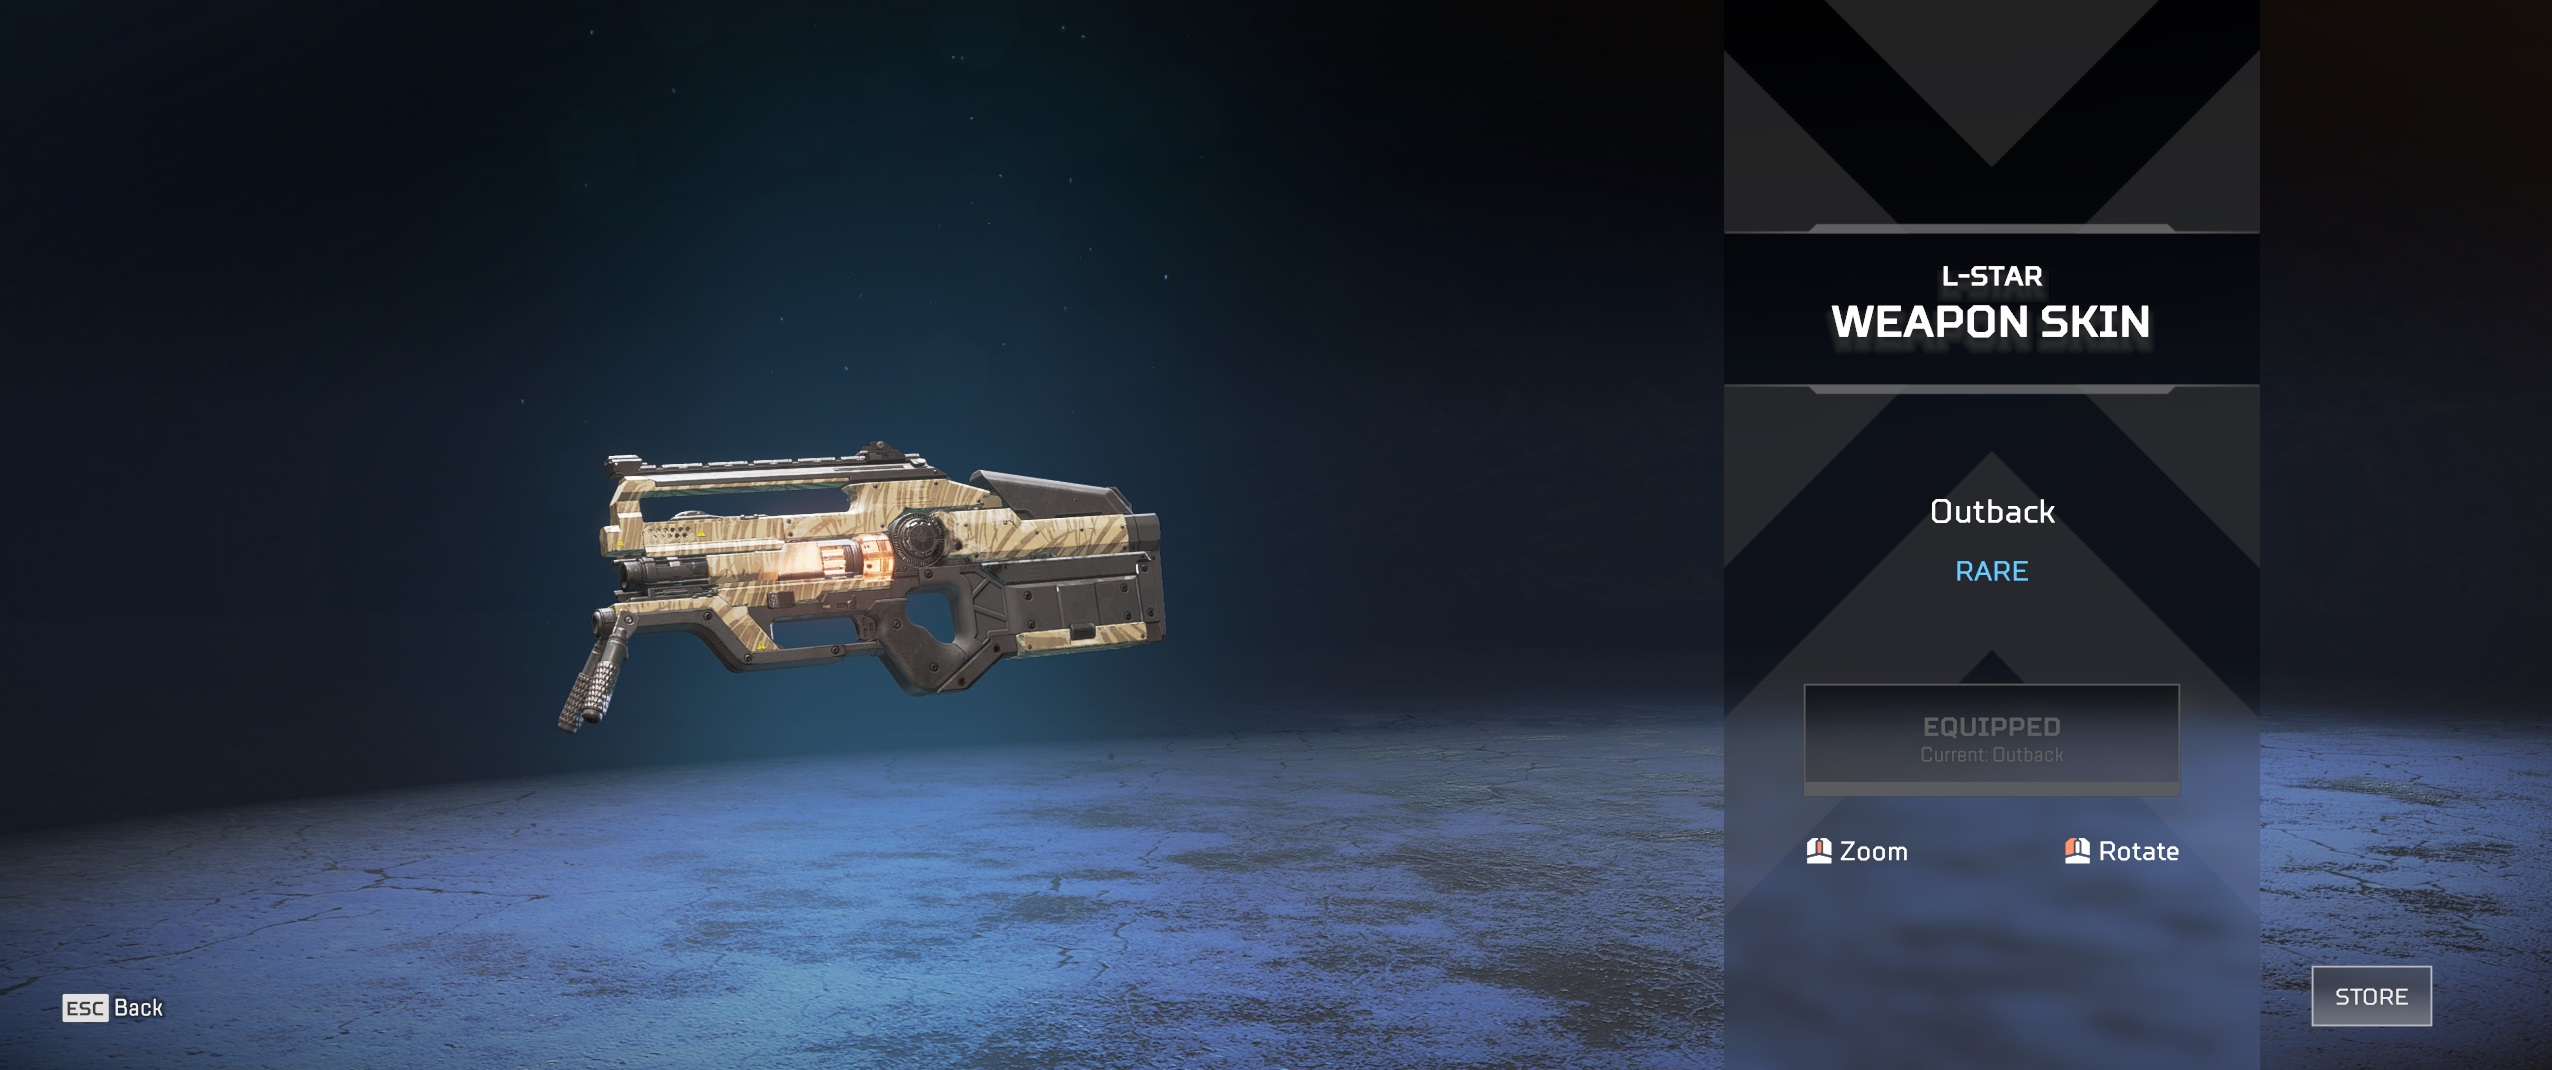 L-Star Weapon Skin